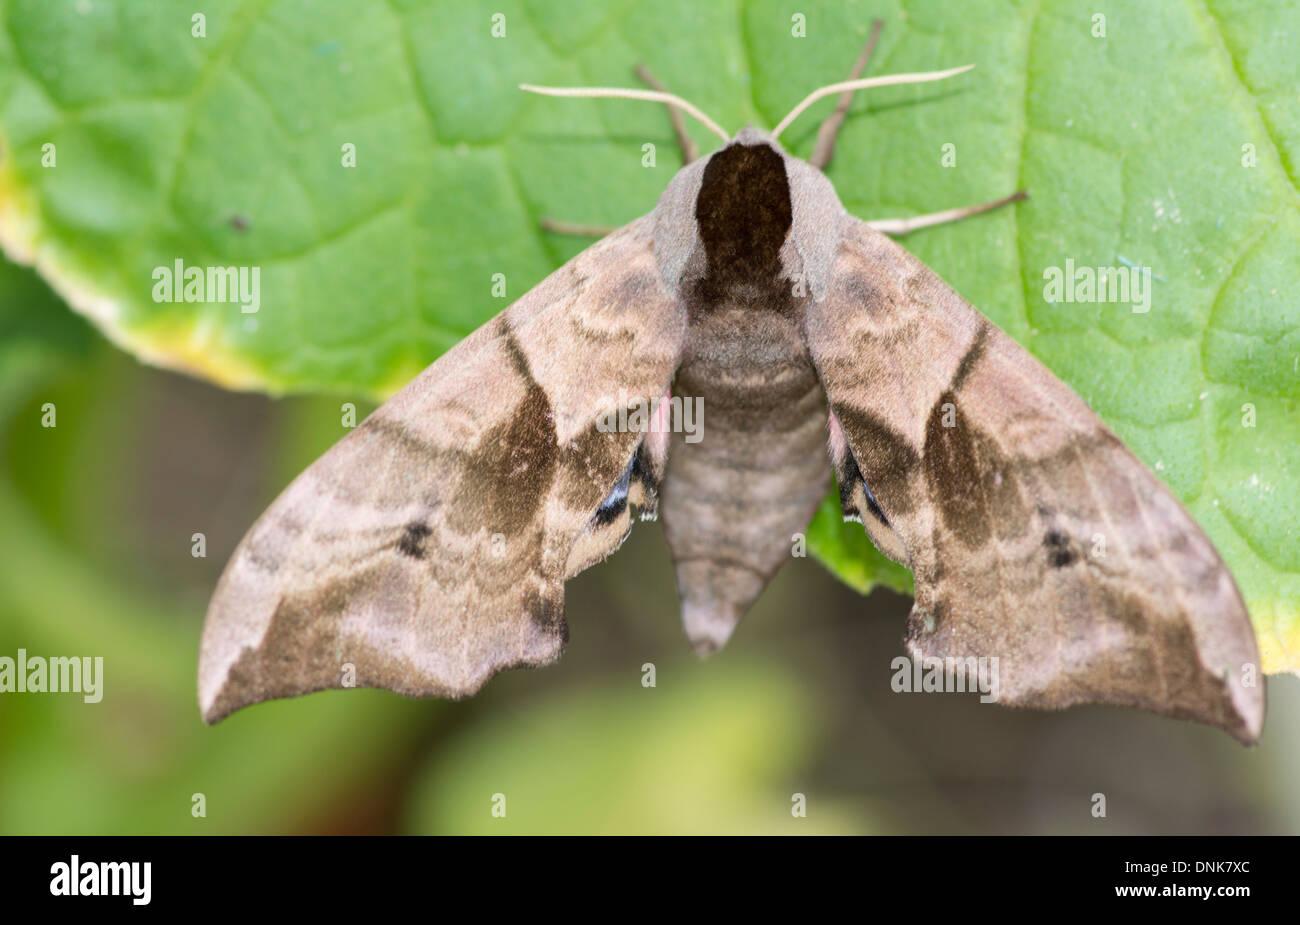 Eyed Hawk-moth, Smerinthus ocellata - Stock Image